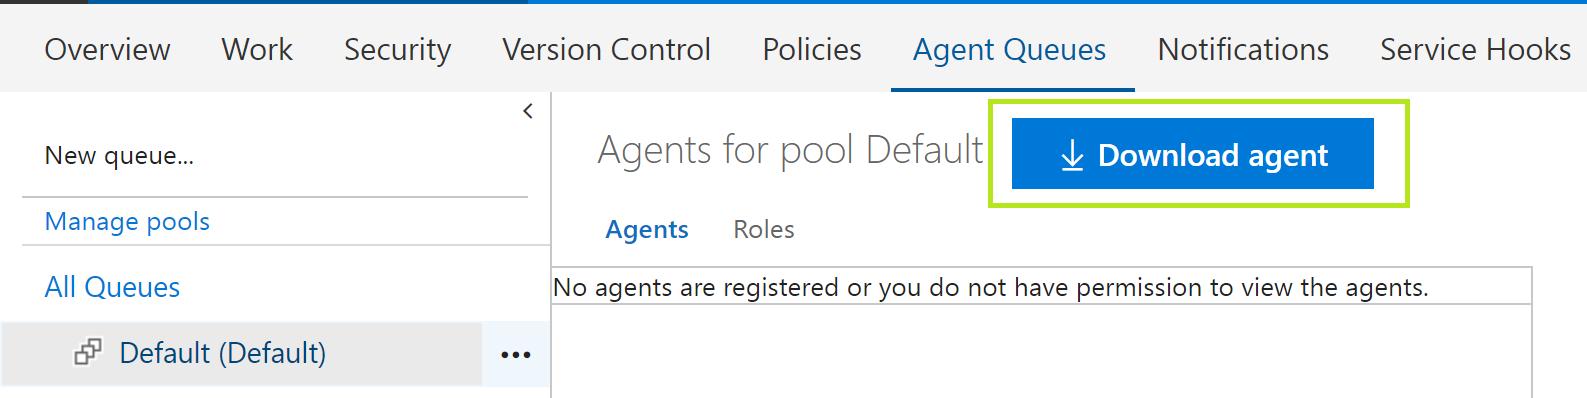 download agent